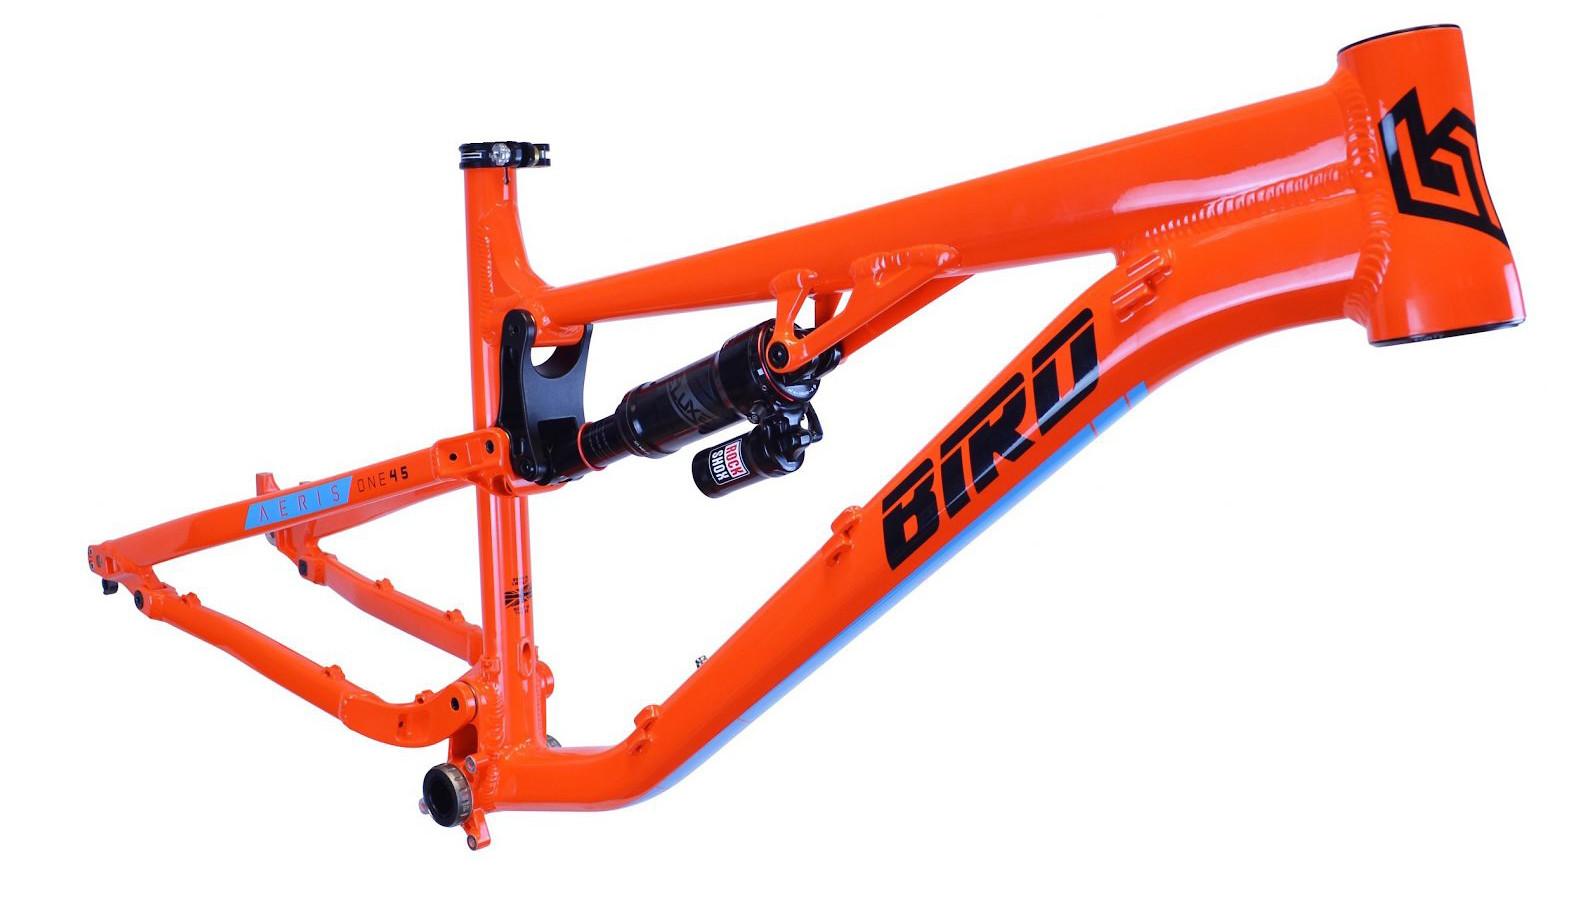 Bird Aeris 145 Frame (Tangerine Orange)